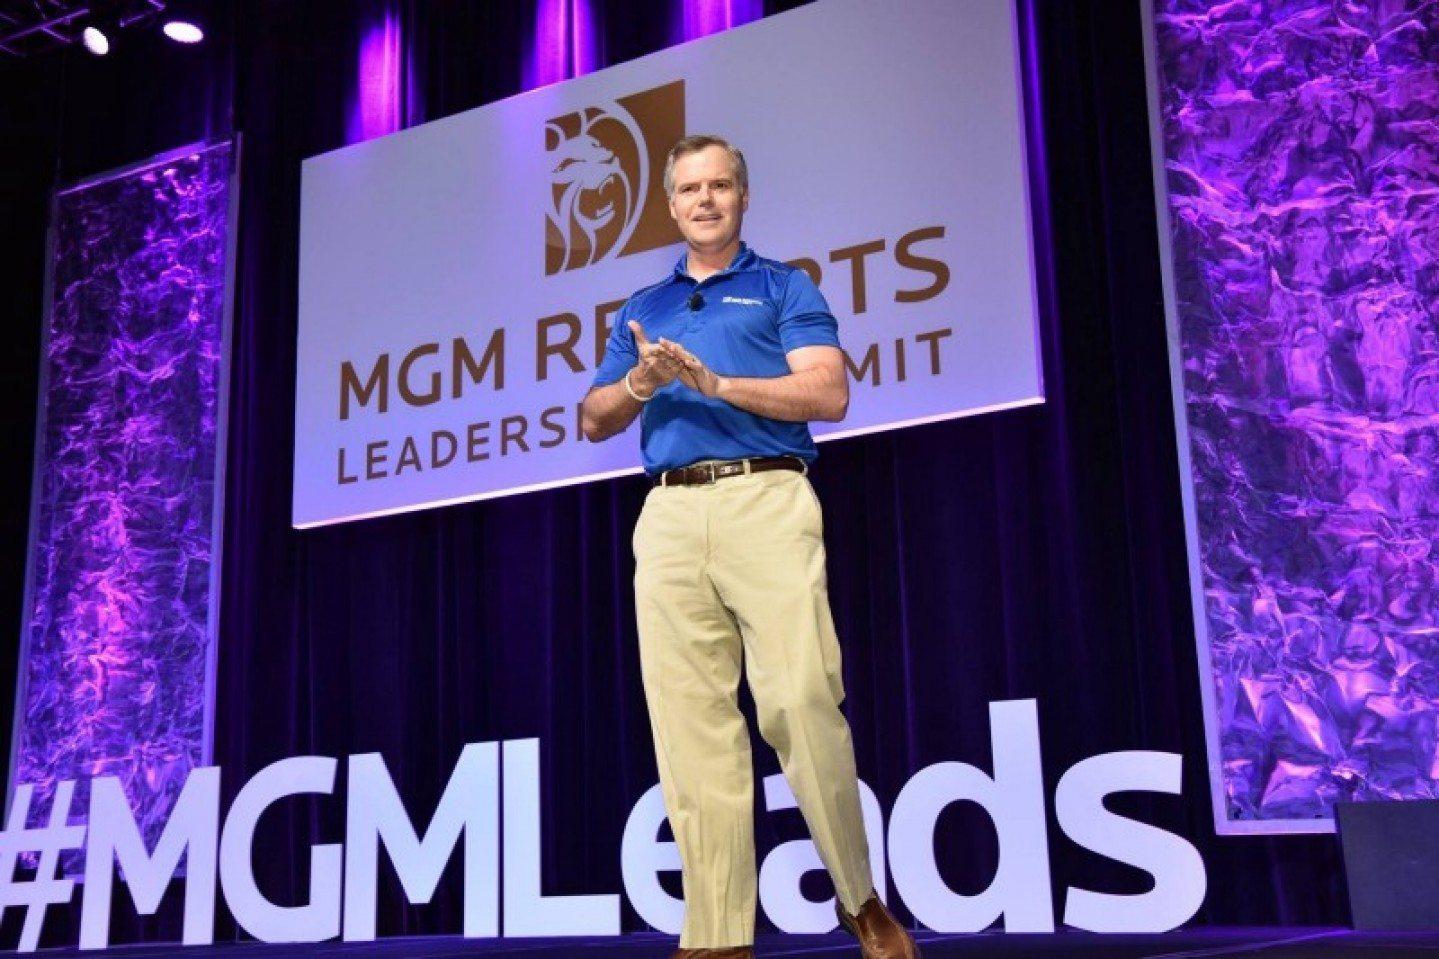 MGM Resorts earnings casino stocks